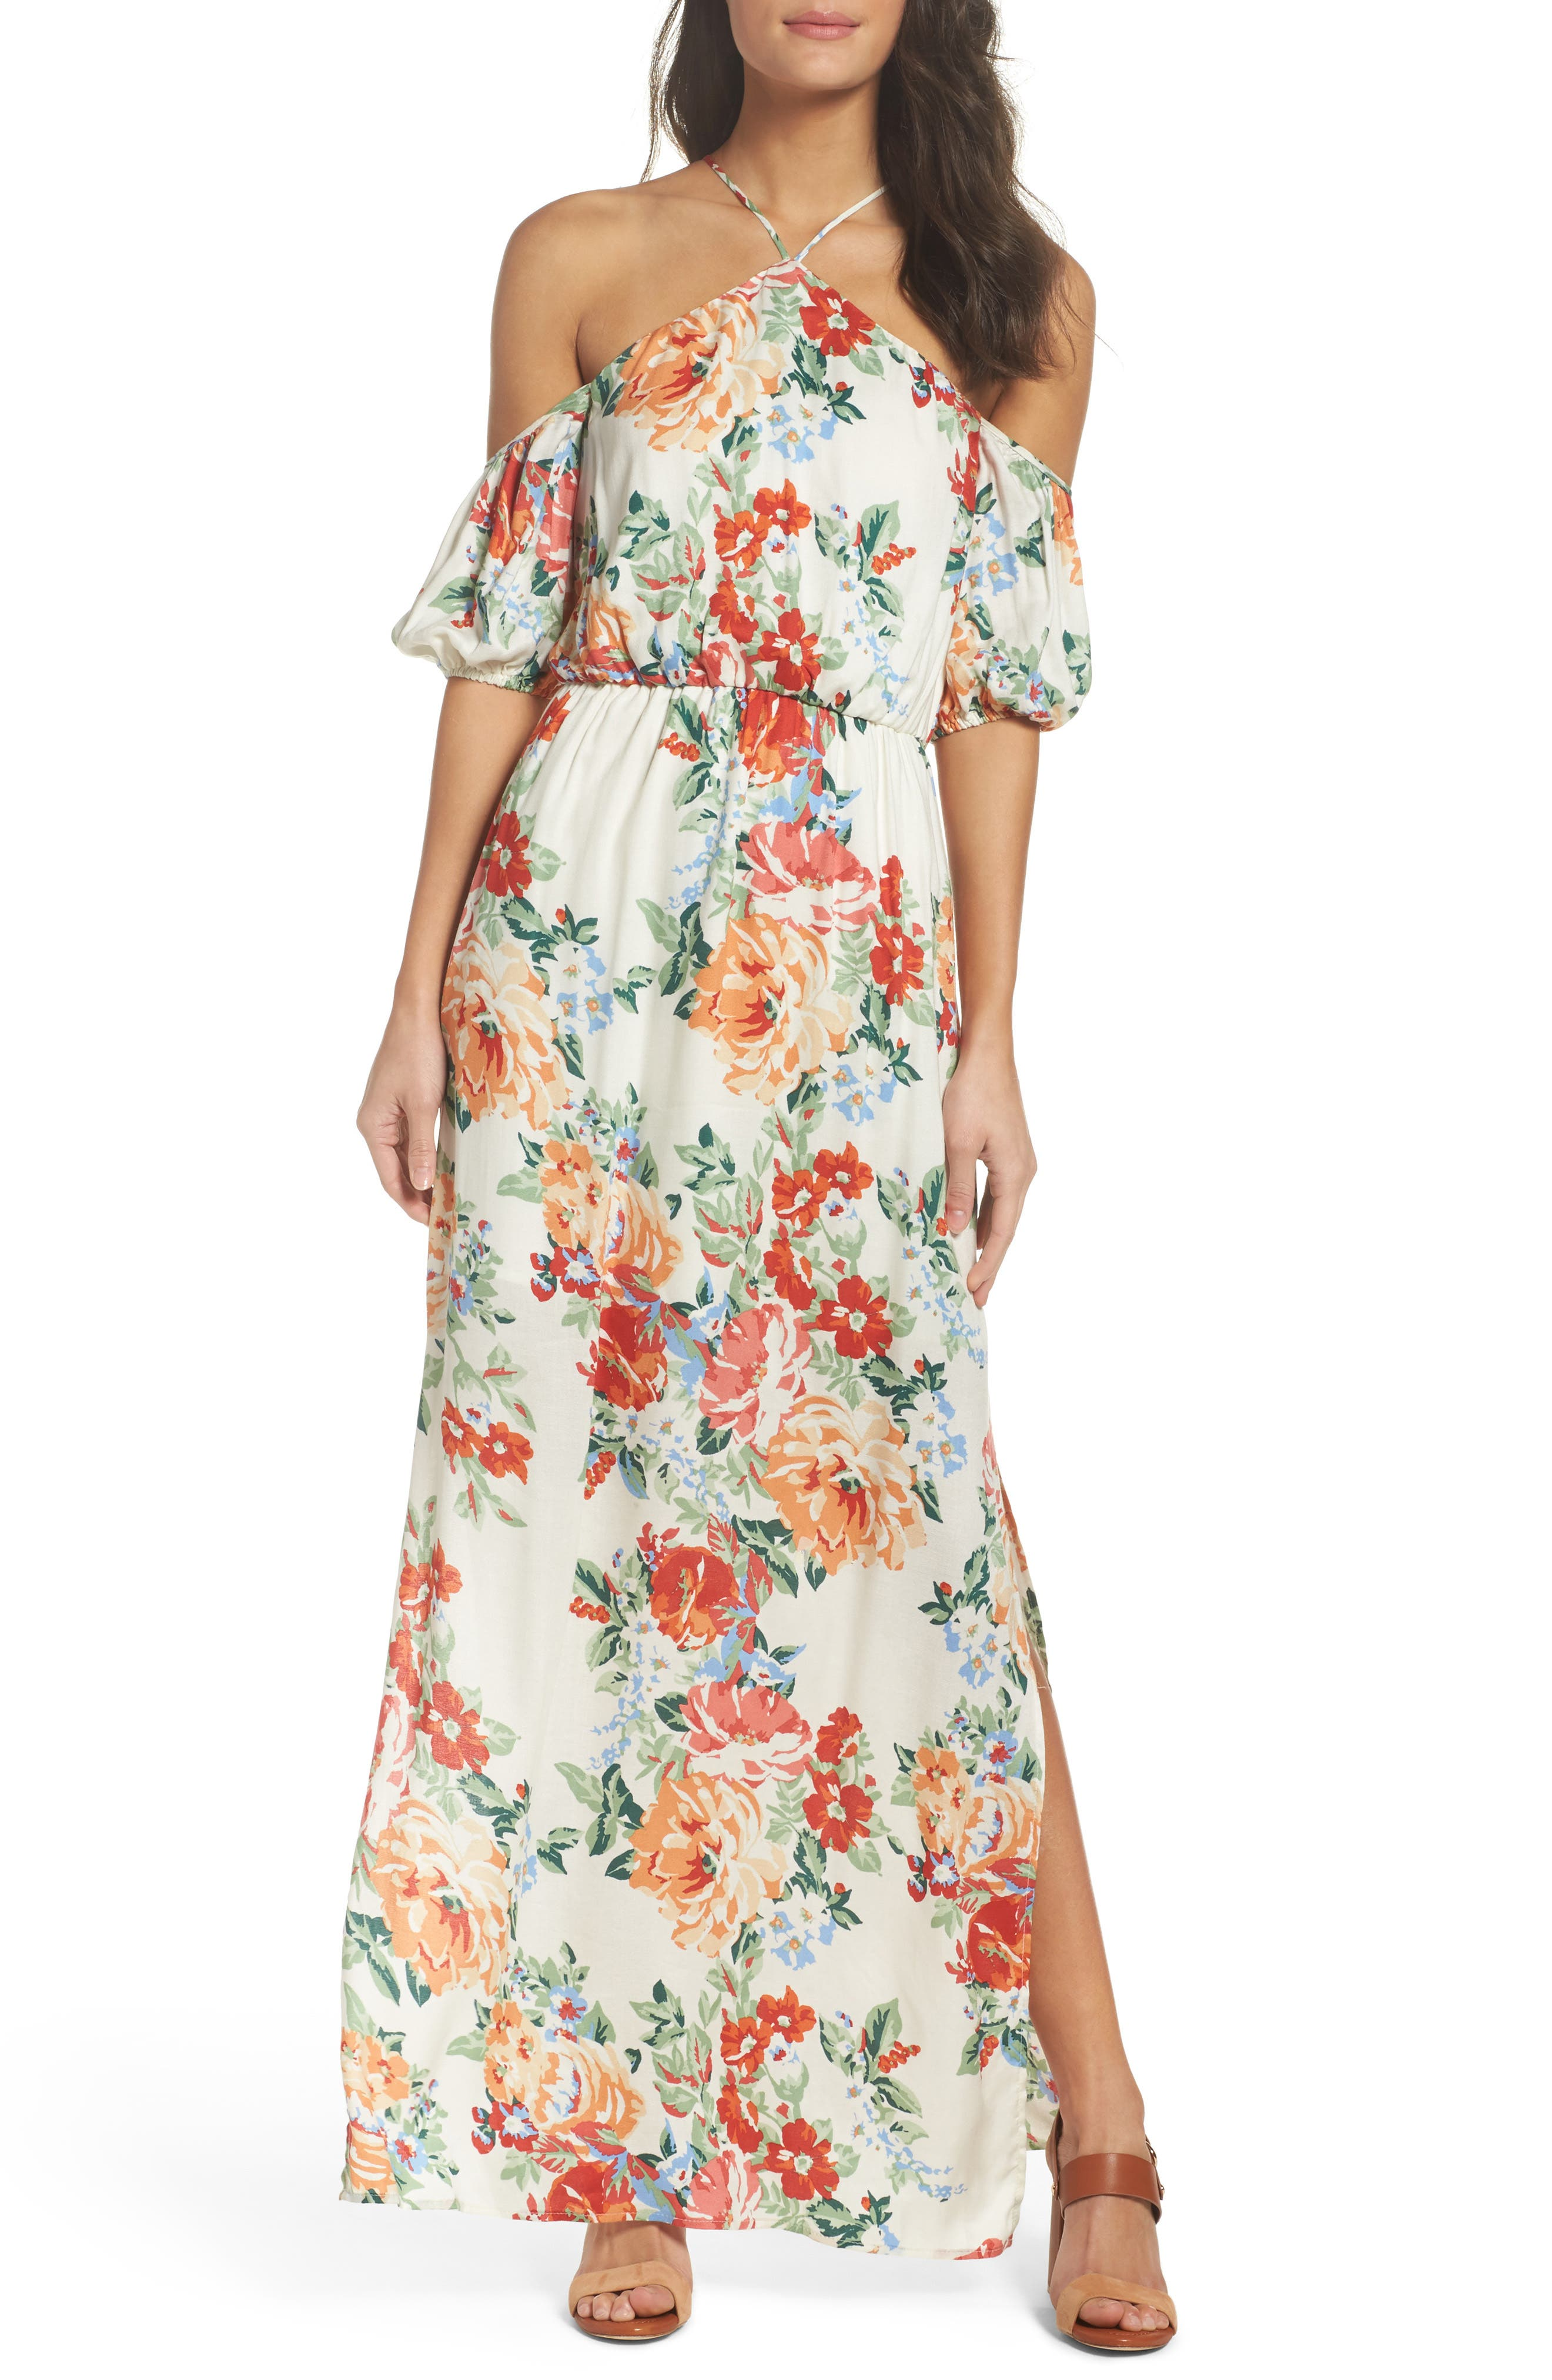 Main Image - Charles Henry Cold Shoulder Blouson Dress (Regular & Petite)